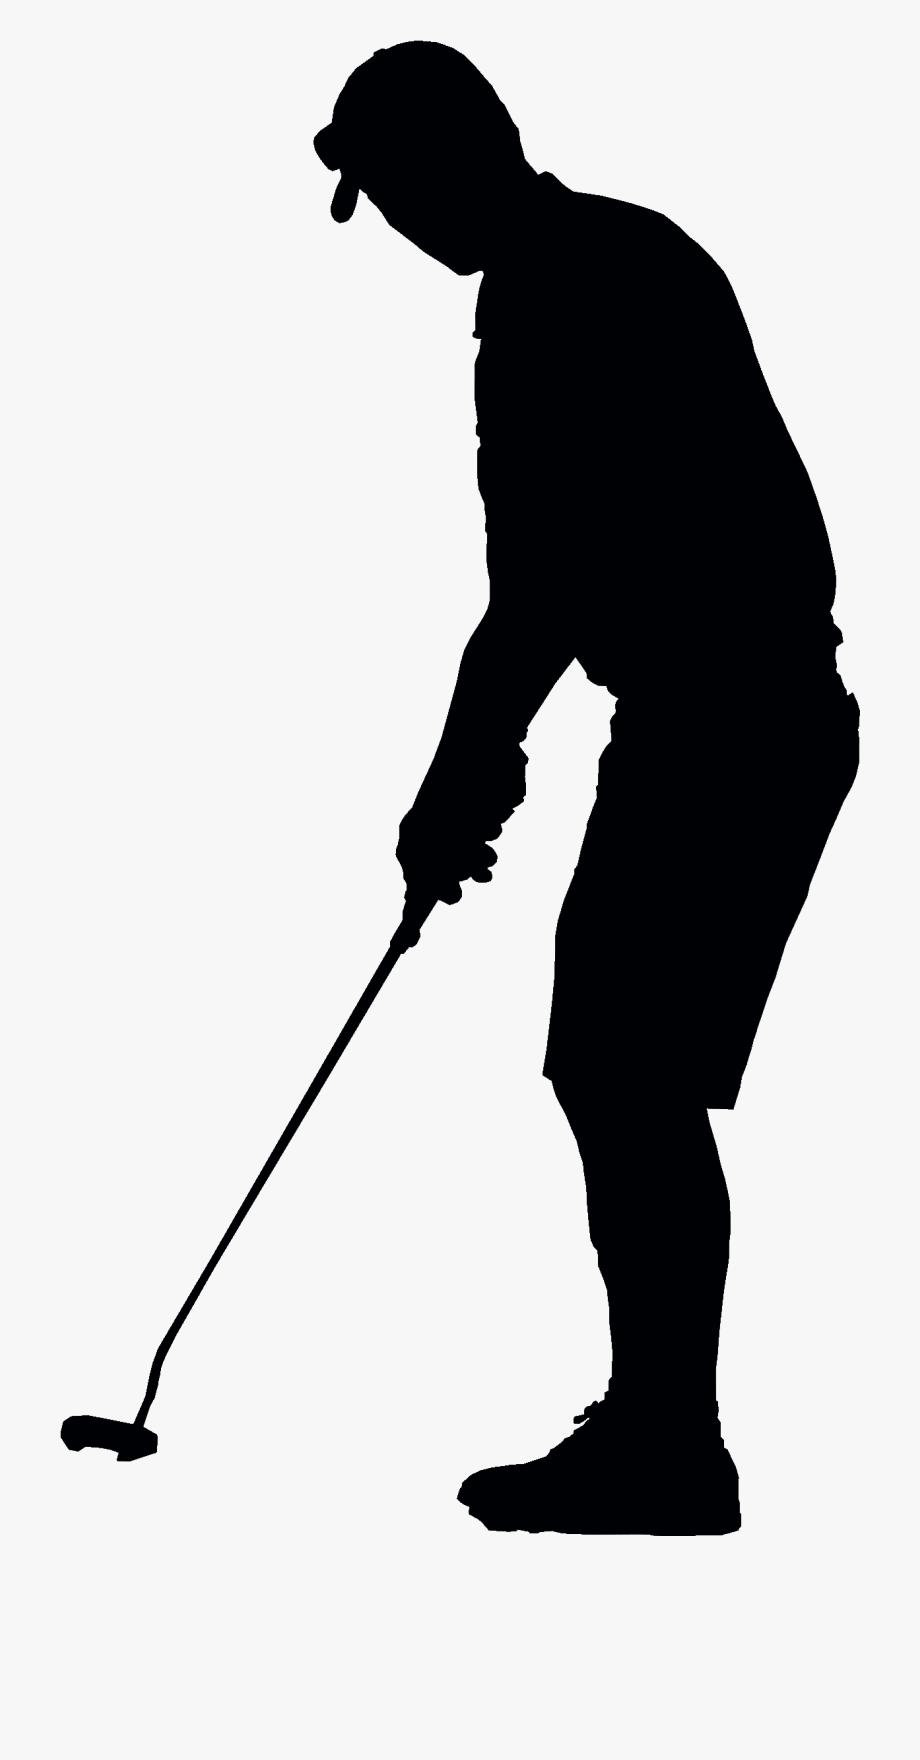 Free download clip art. Golfer clipart golf club